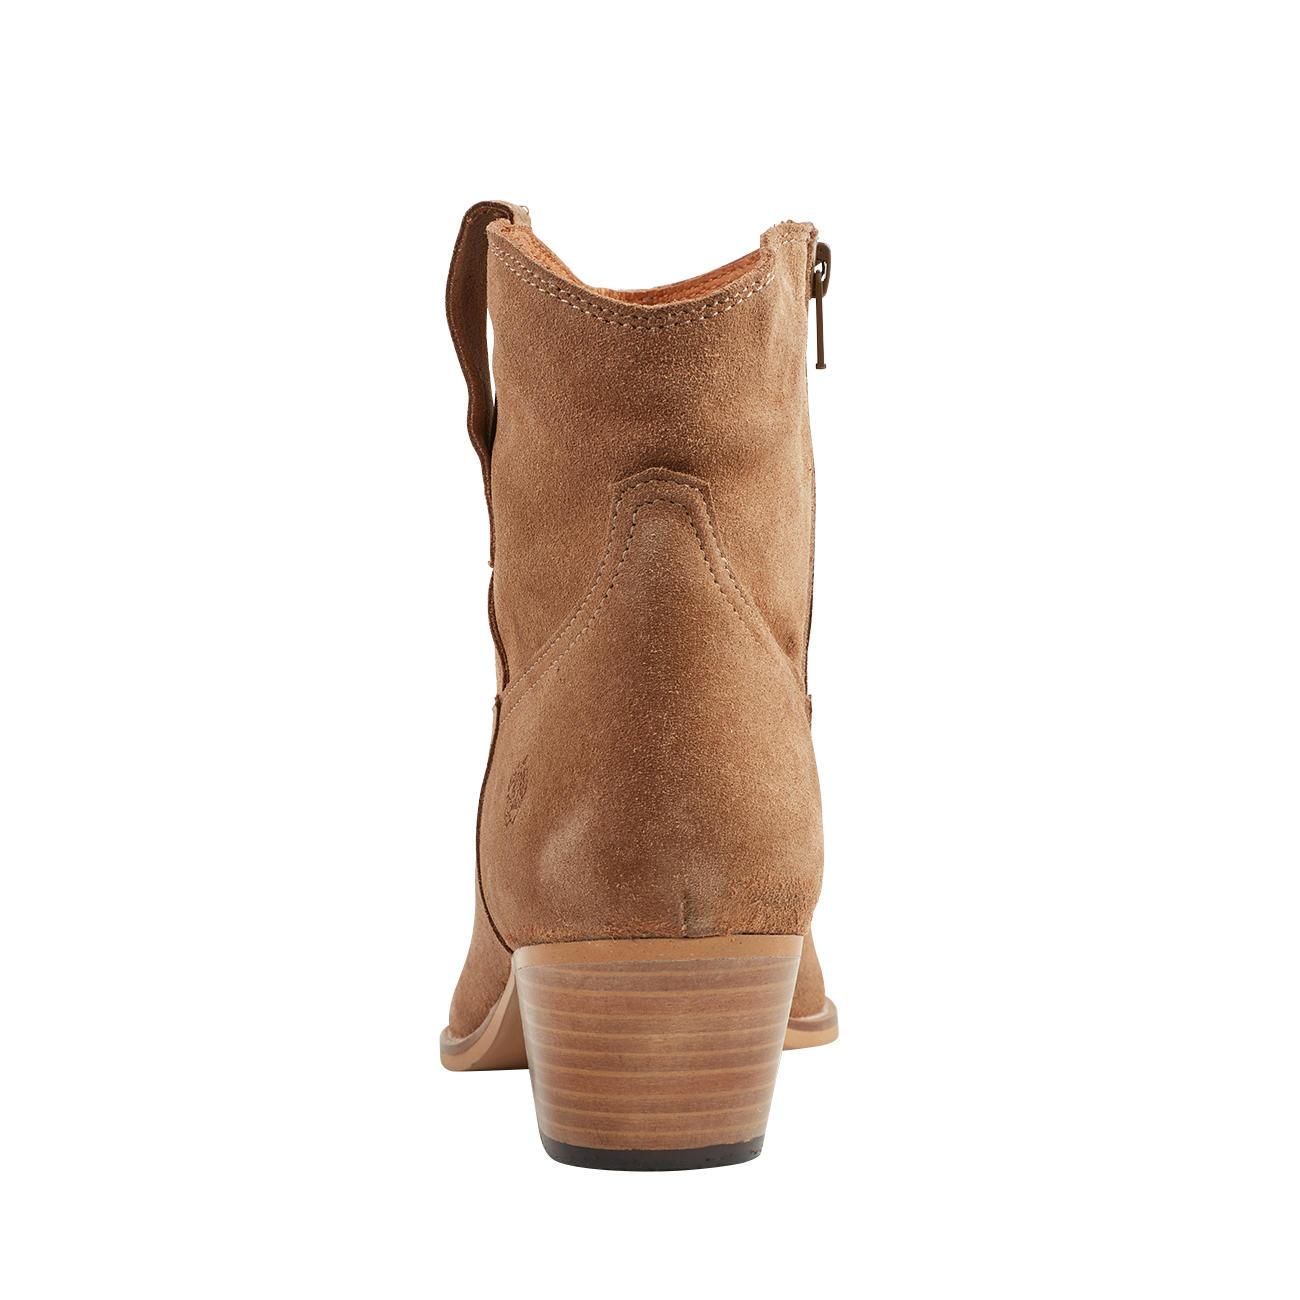 Apple of Eden Cowboy Boots | Mode Klassiker entdecken